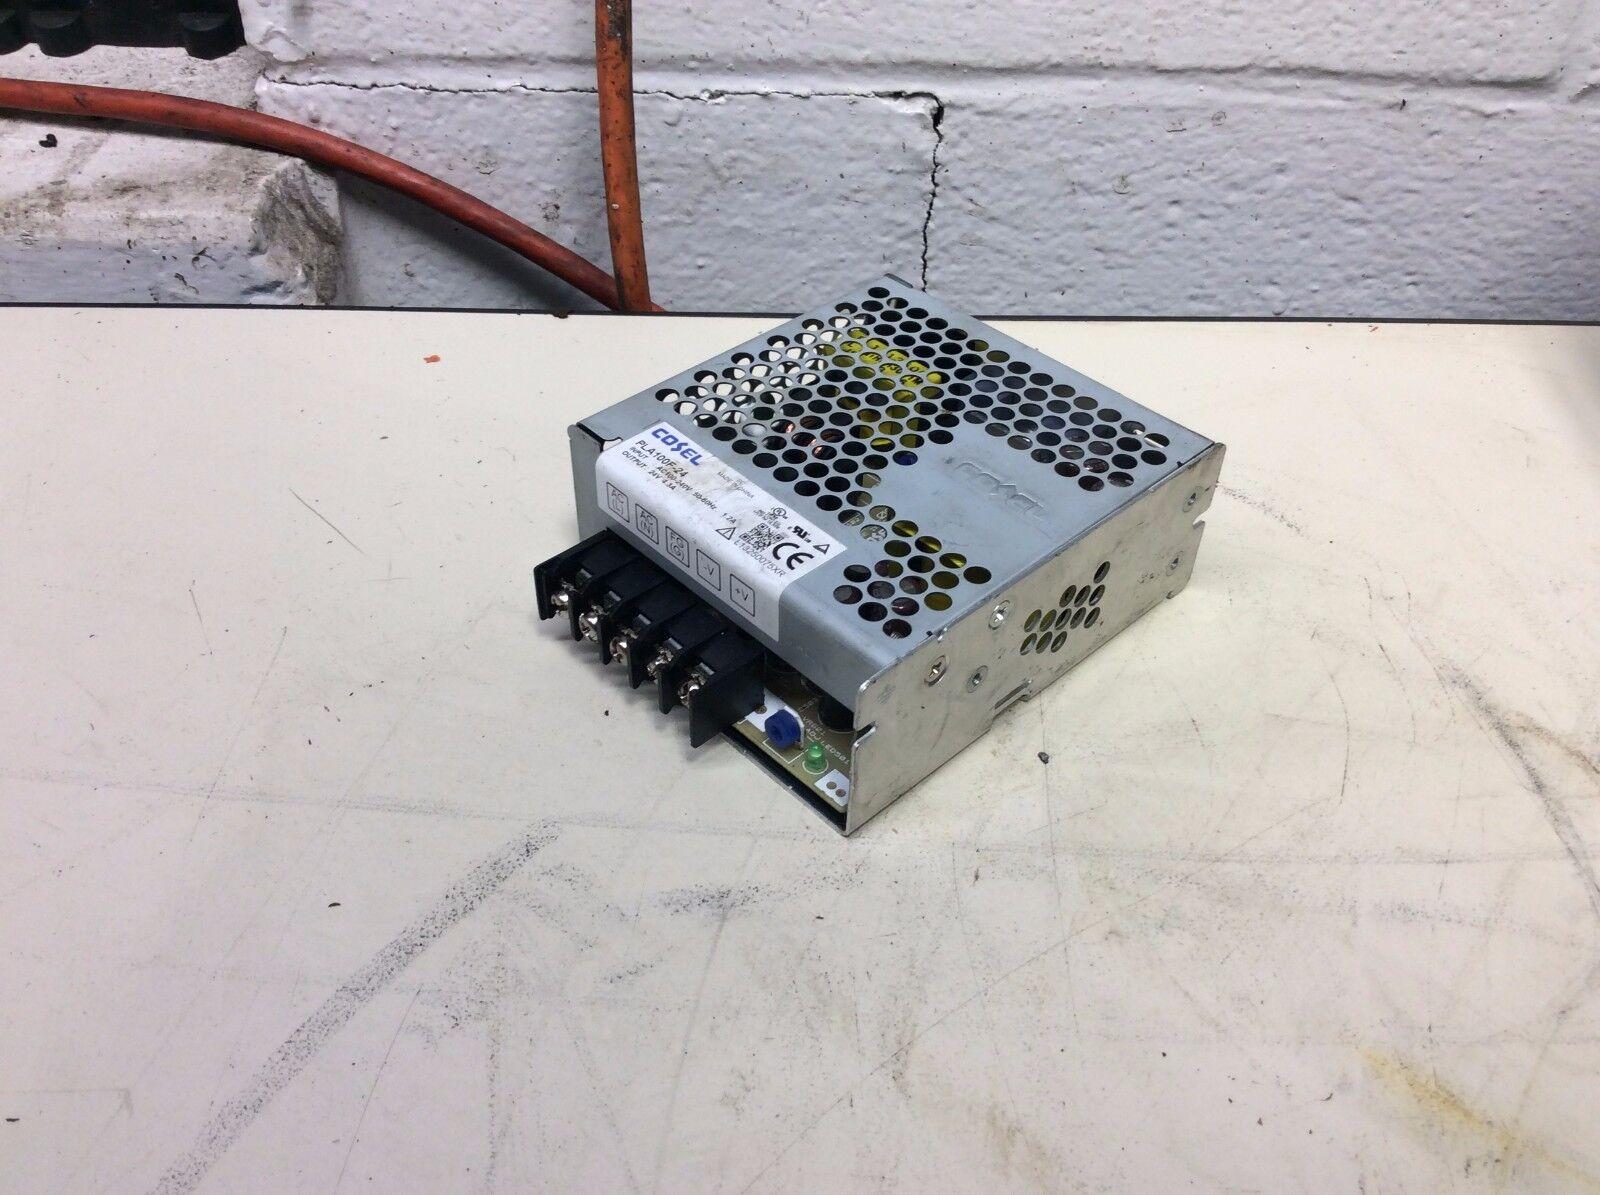 Cosel Power Supply Unit, # PLA100F-24, 24v @ 4.3 A, Used, Warranty